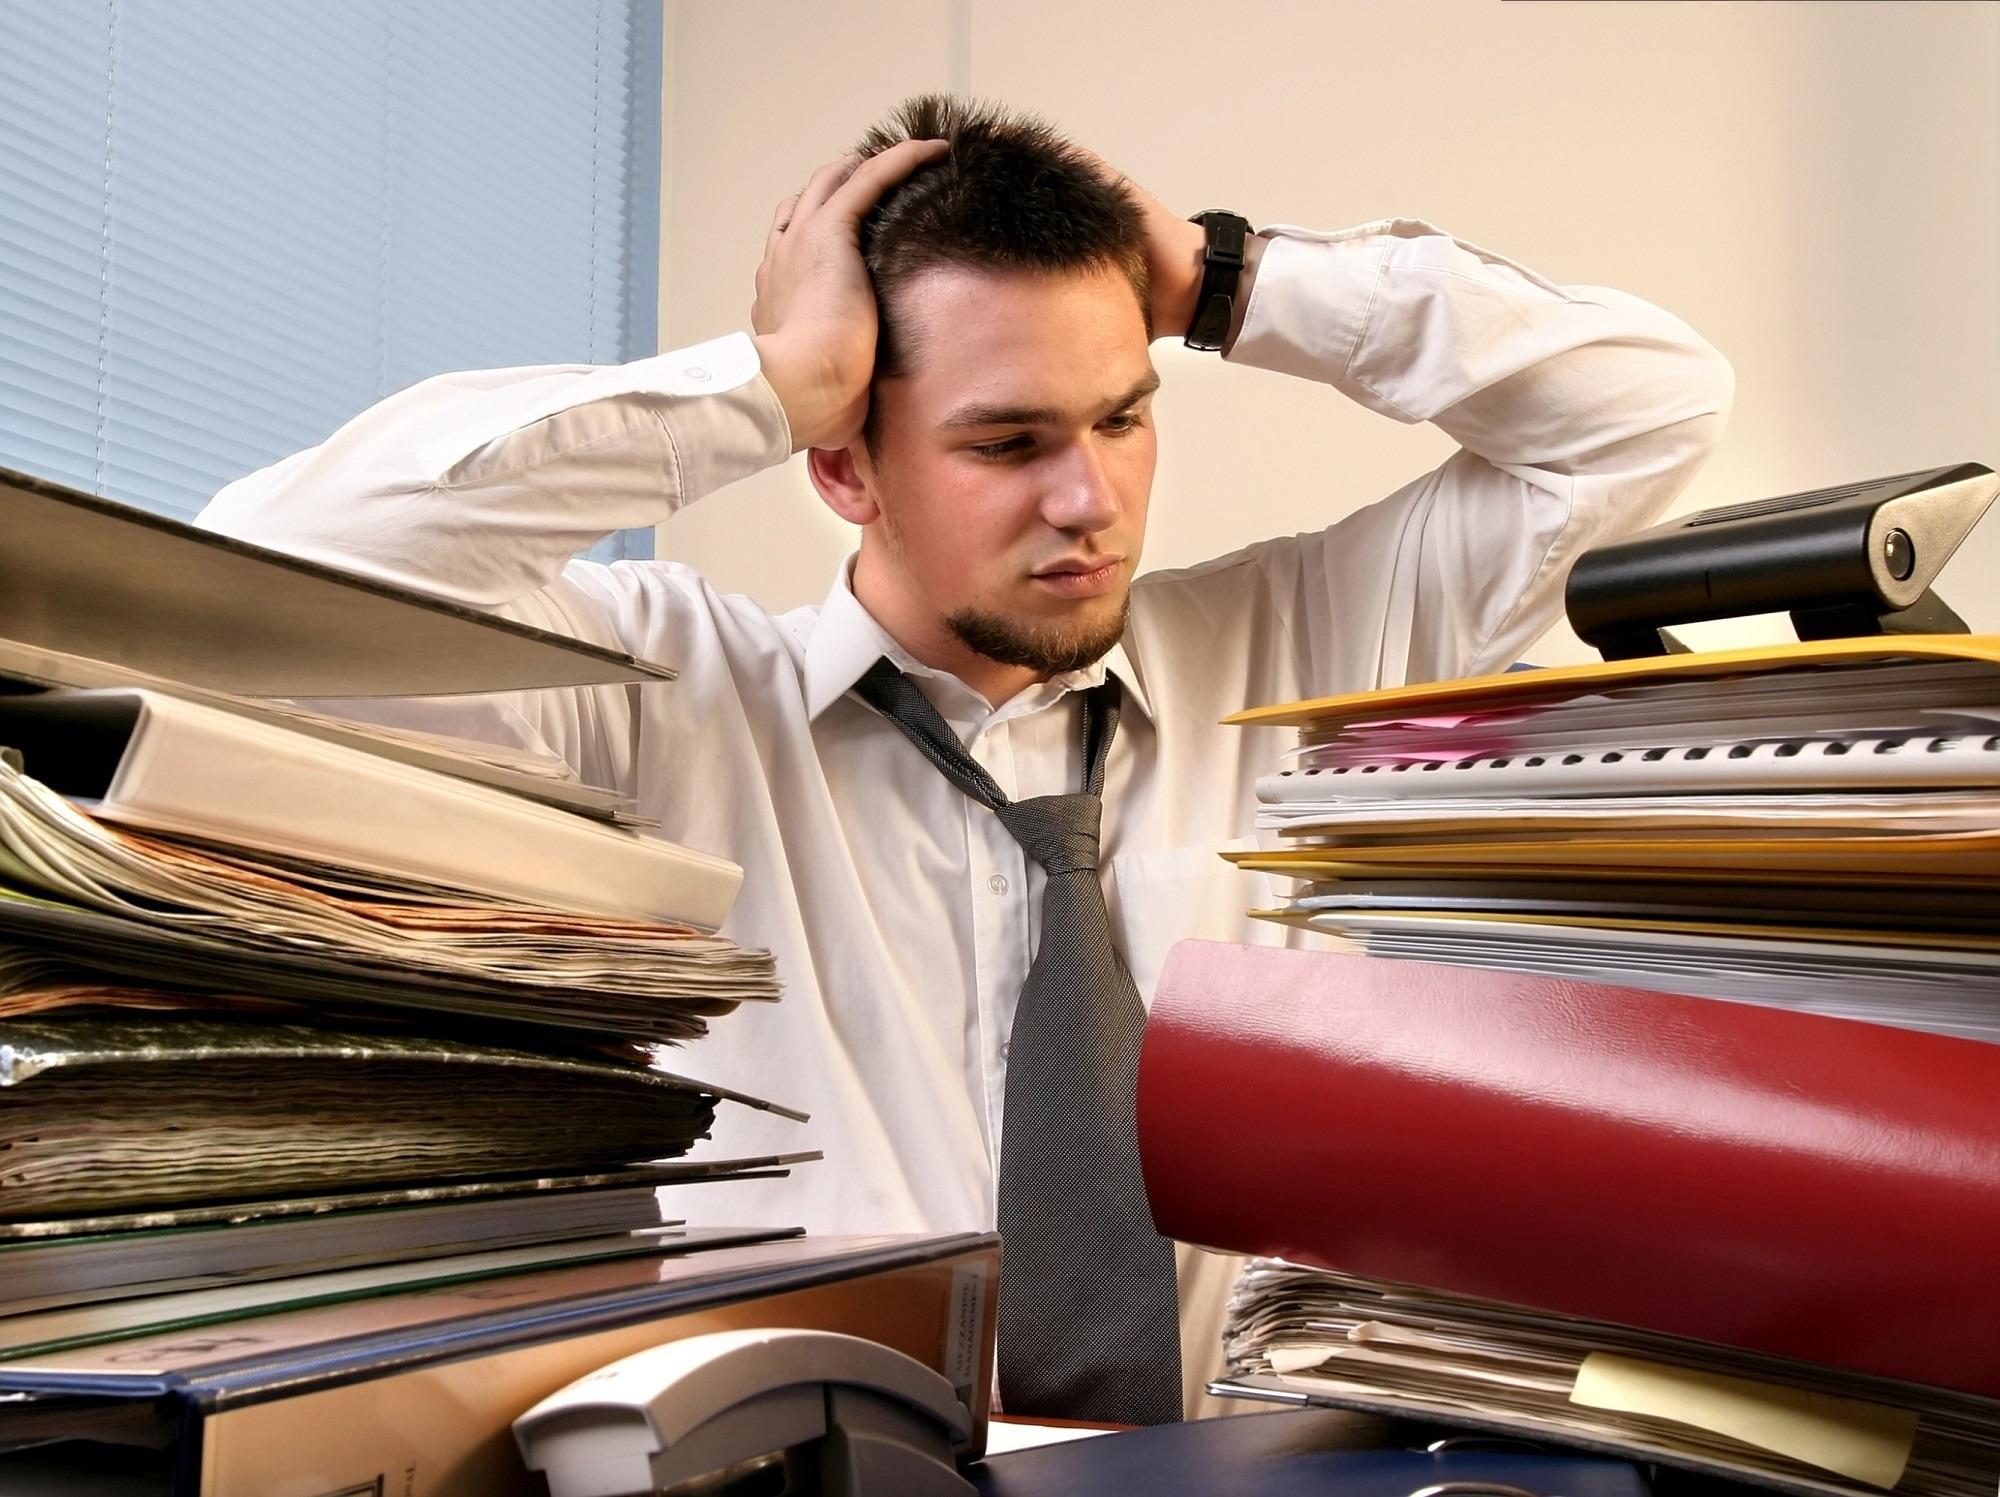 Overwhelmed businessman